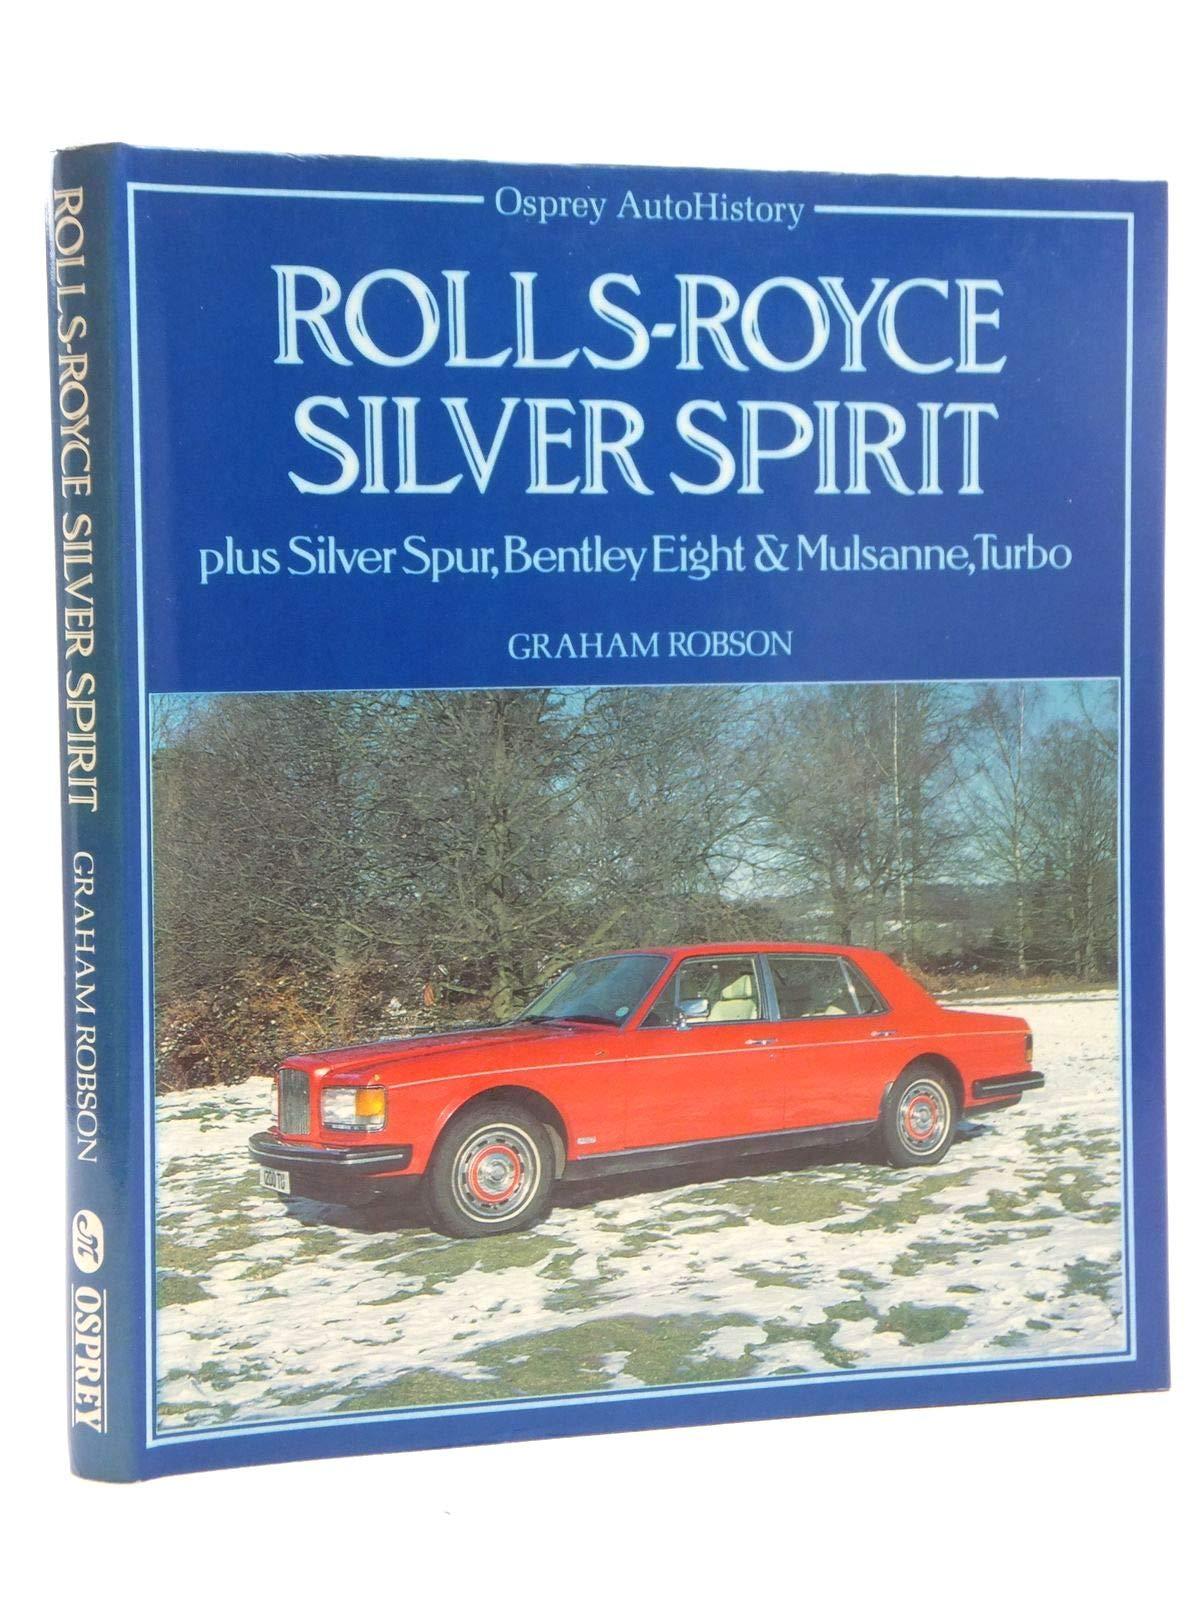 AUTOHISTS ROLLS-ROYCE SILVER SPIRI (Auto History S.): Amazon.es: Graham Robson: Libros en idiomas extranjeros